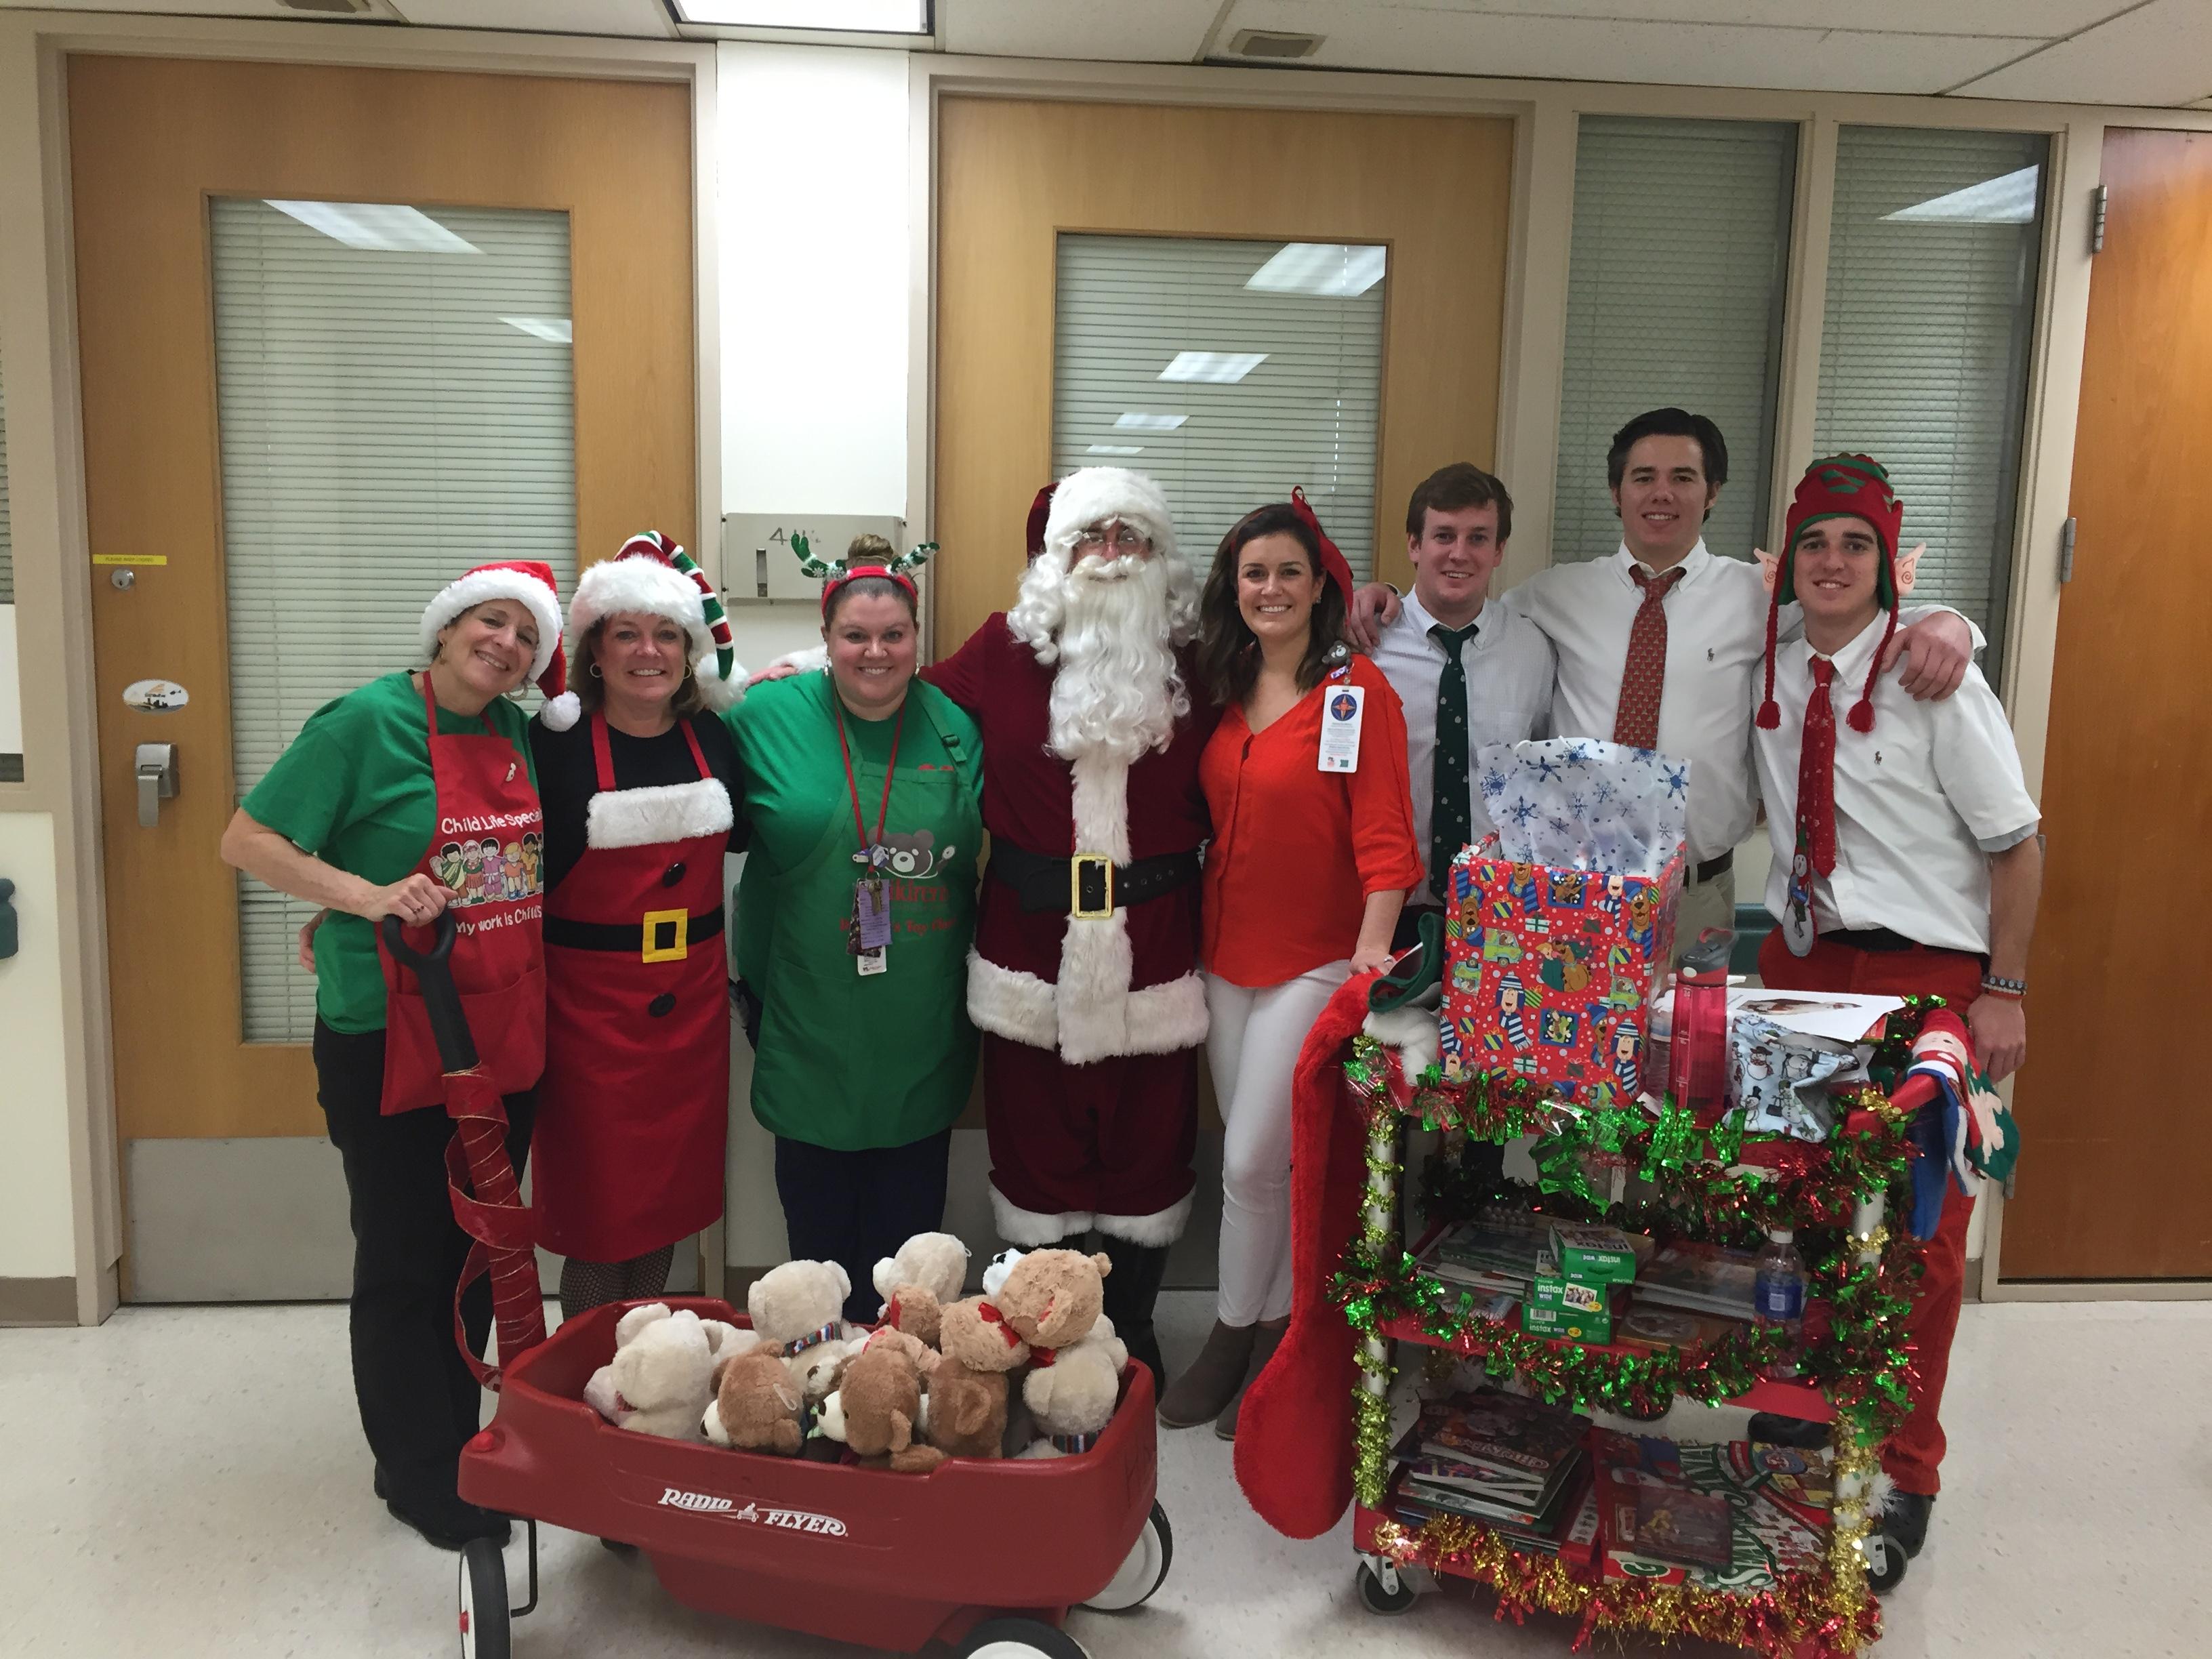 Childrenu0027s National Opens Dr. Bearu0027s Toy Closet Over Holiday Season |  Childrenu0027s National